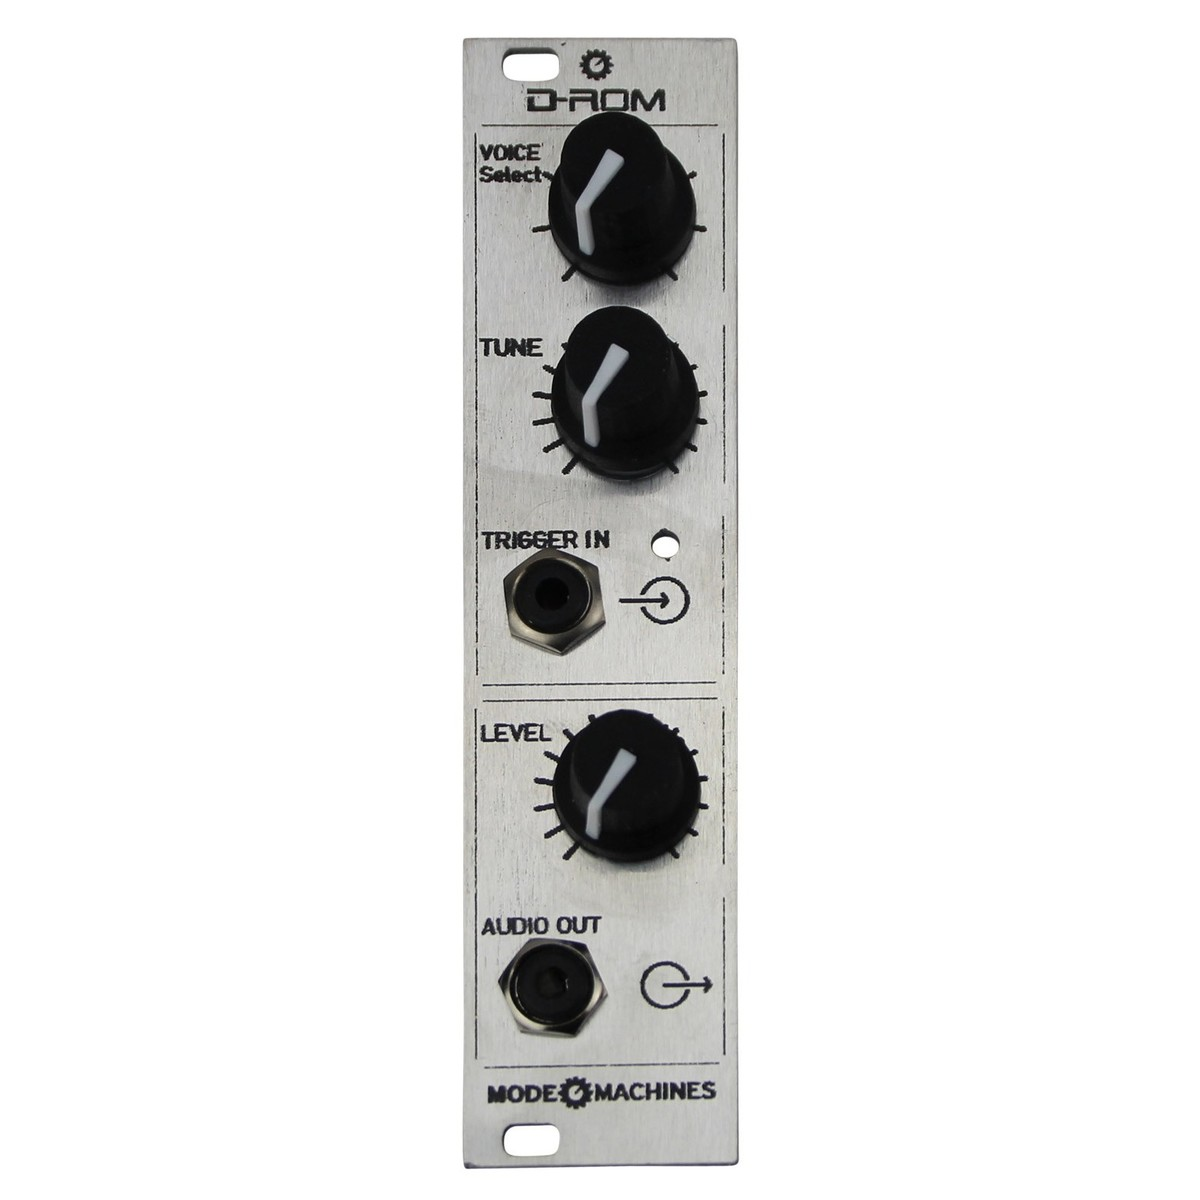 mode machines d rom 8 bit drum expander at gear4music. Black Bedroom Furniture Sets. Home Design Ideas